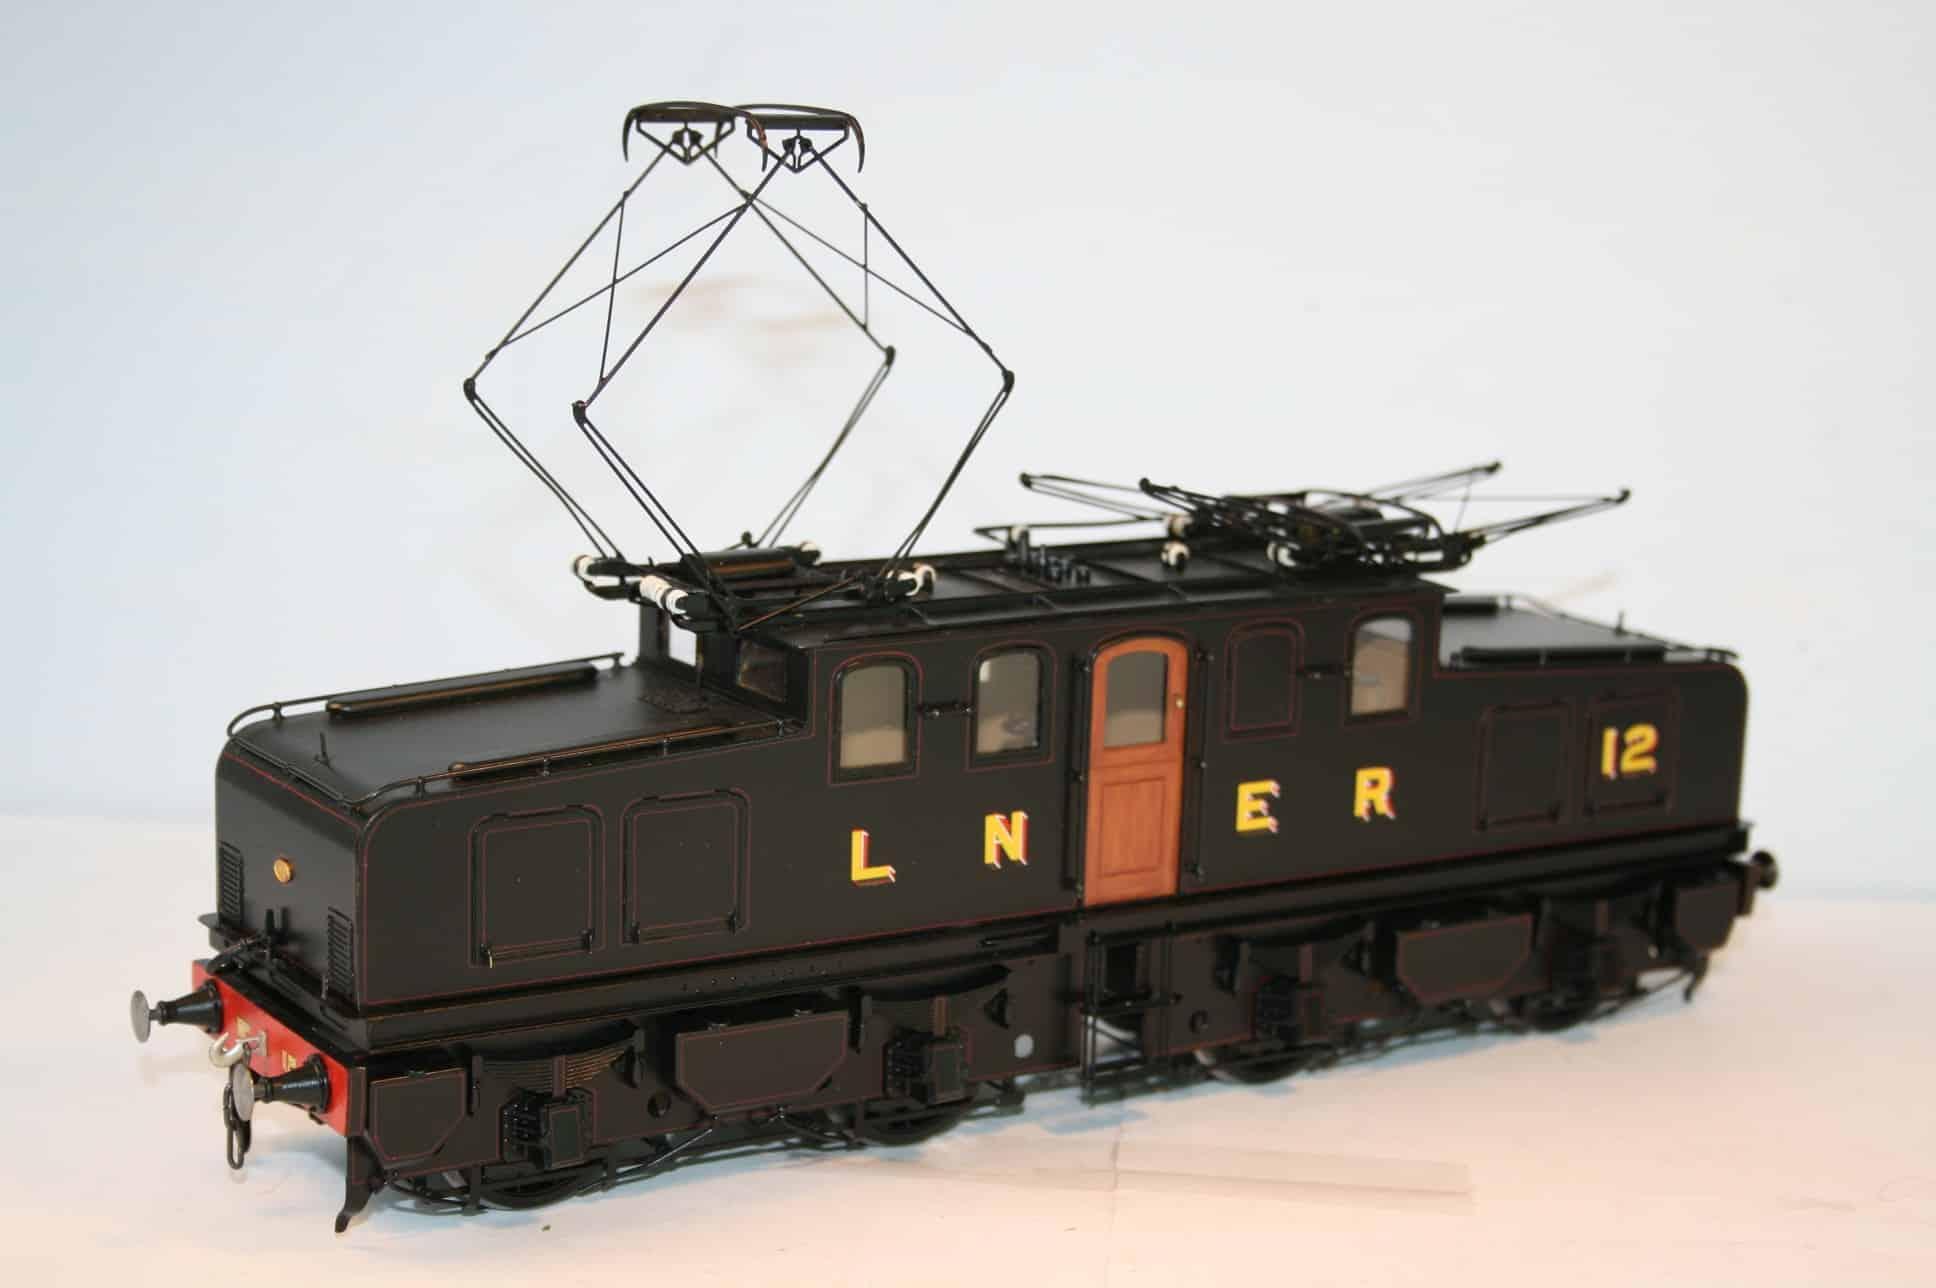 LNER (Ex NER) Class EF1 Bo+Bo Electric Locomotive number 12